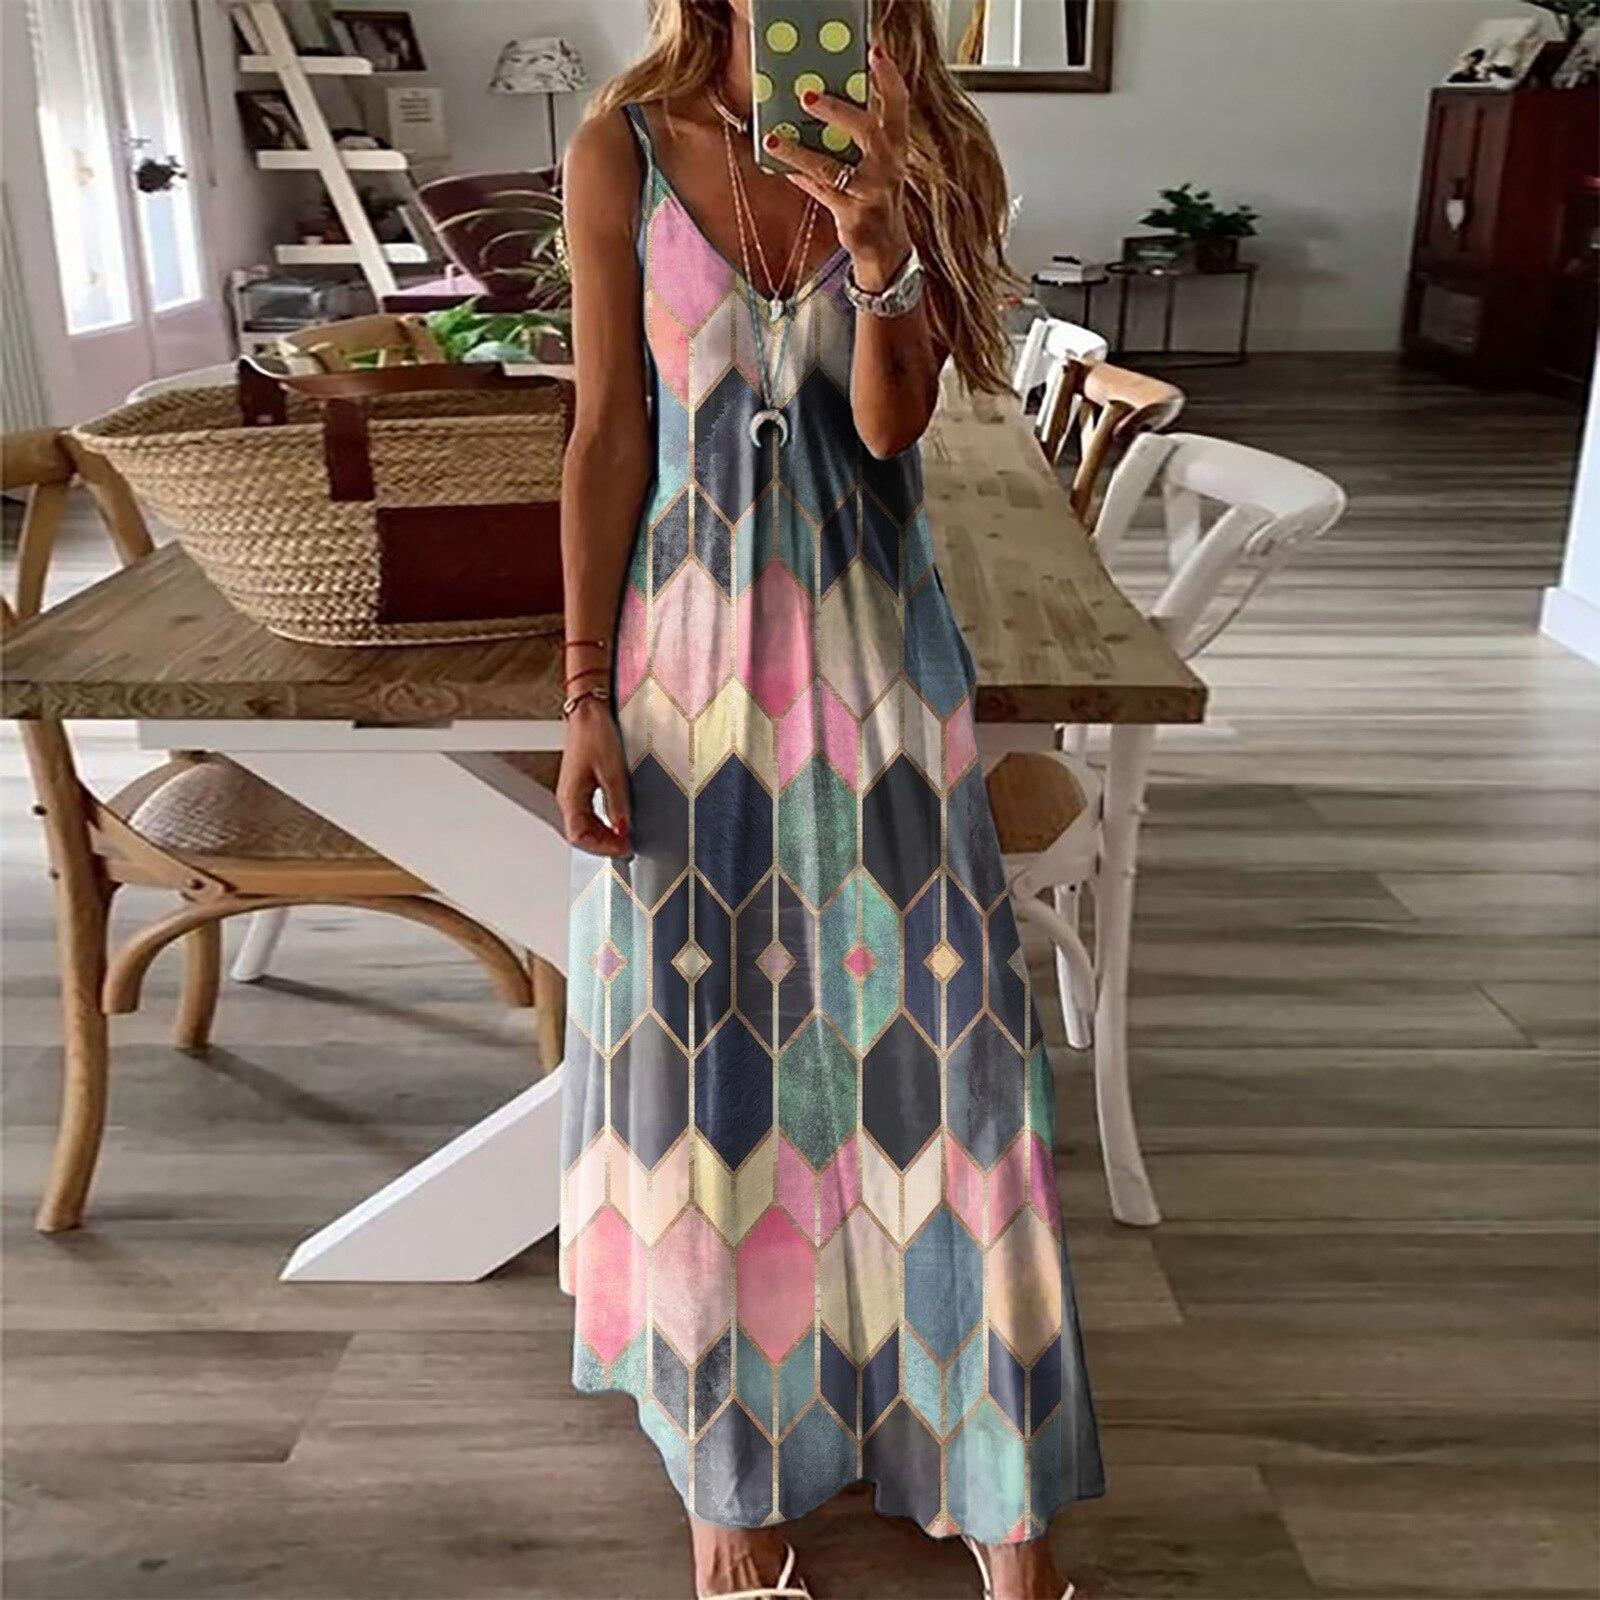 Women's Summer Casual Printed Camisole Long Dress Fashion Sexy Plus Size Dress Bohemian Dress 9